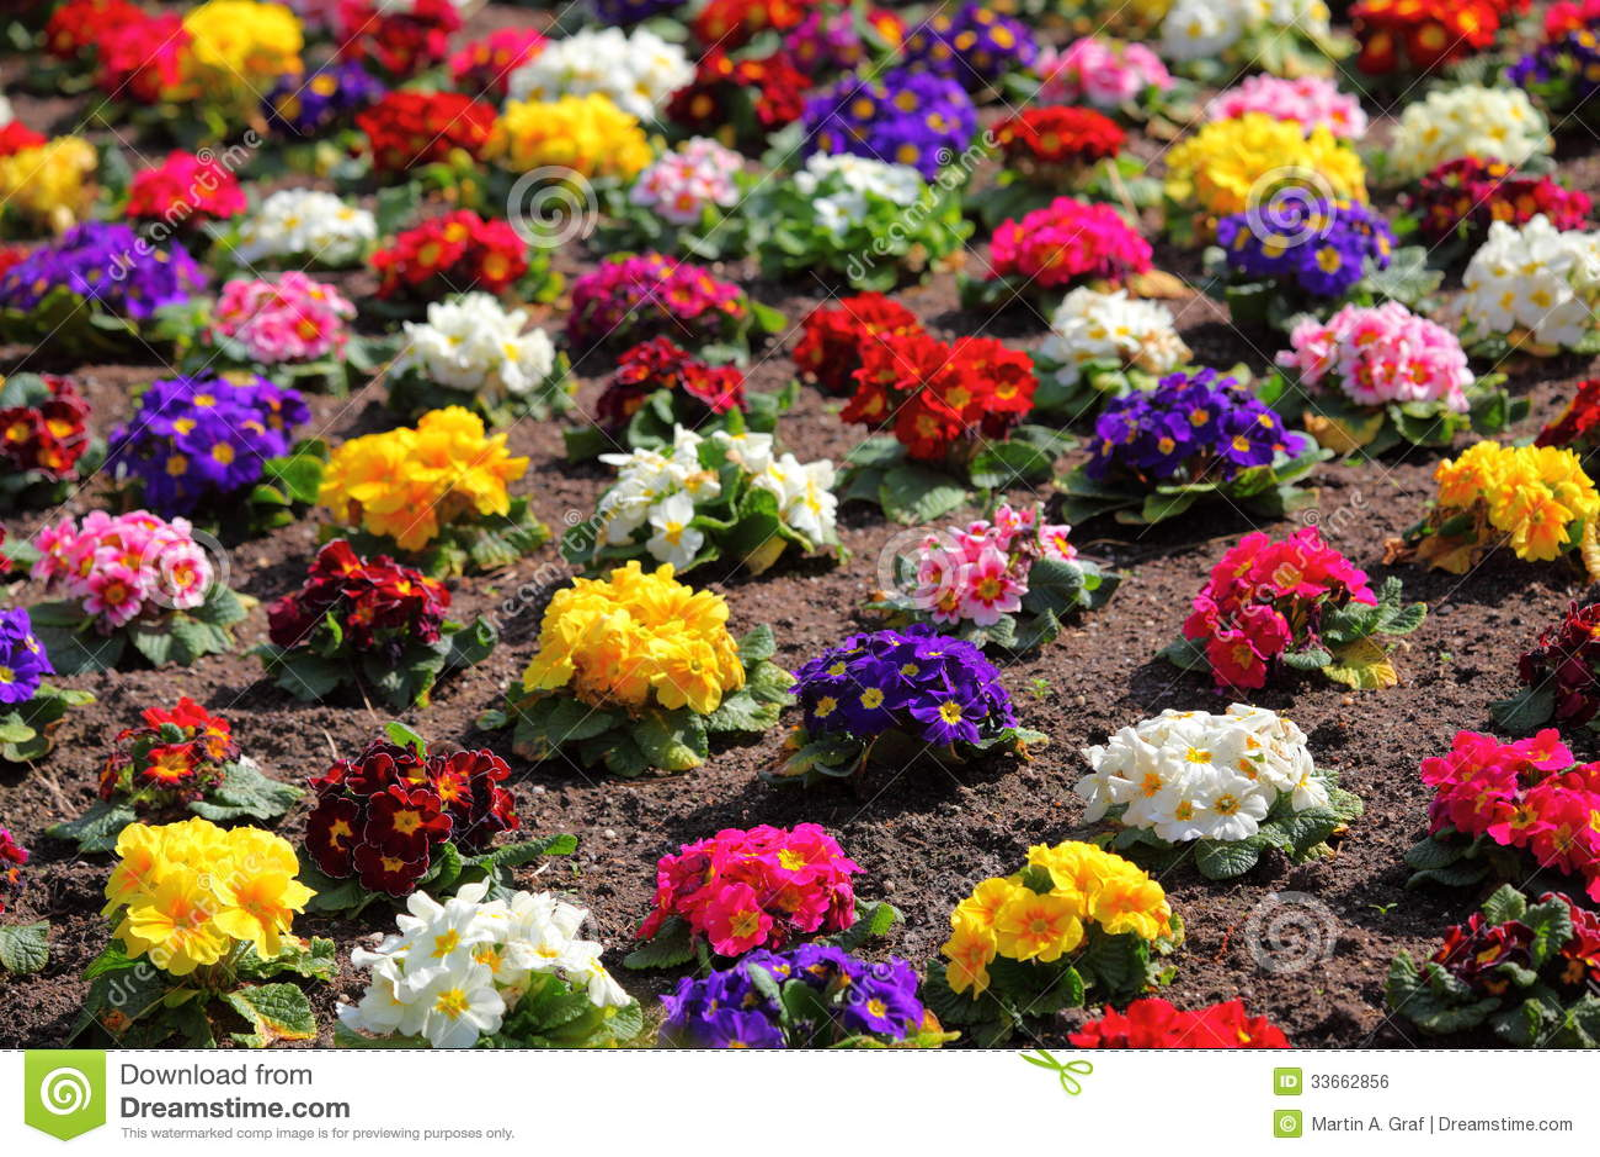 Colorful Flowerbed Of Primula Vulgaris Royalty Free Stock ...